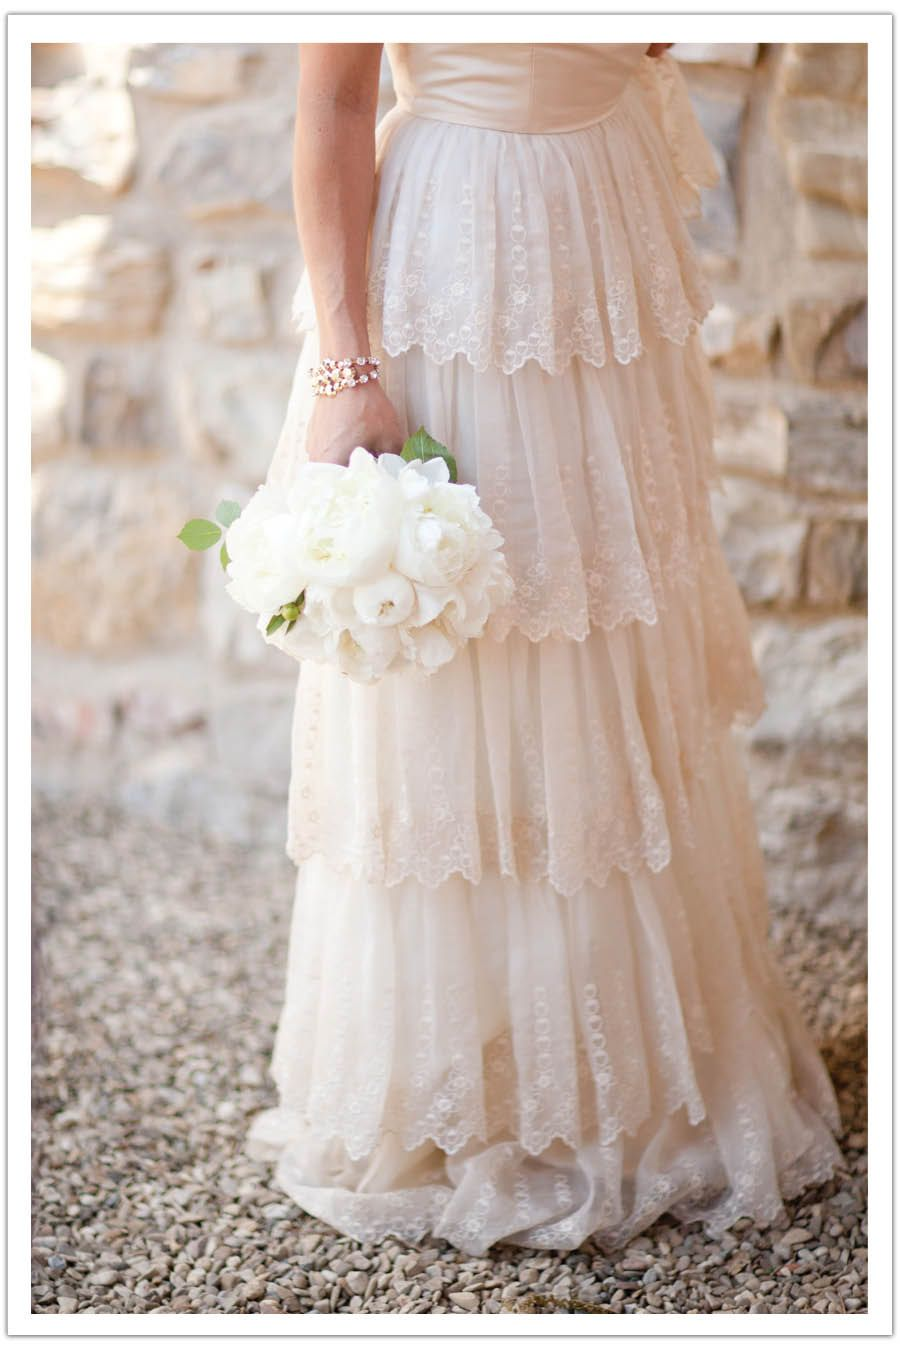 Tiered lace wedding dress gorgeous uc pinterest lace wedding